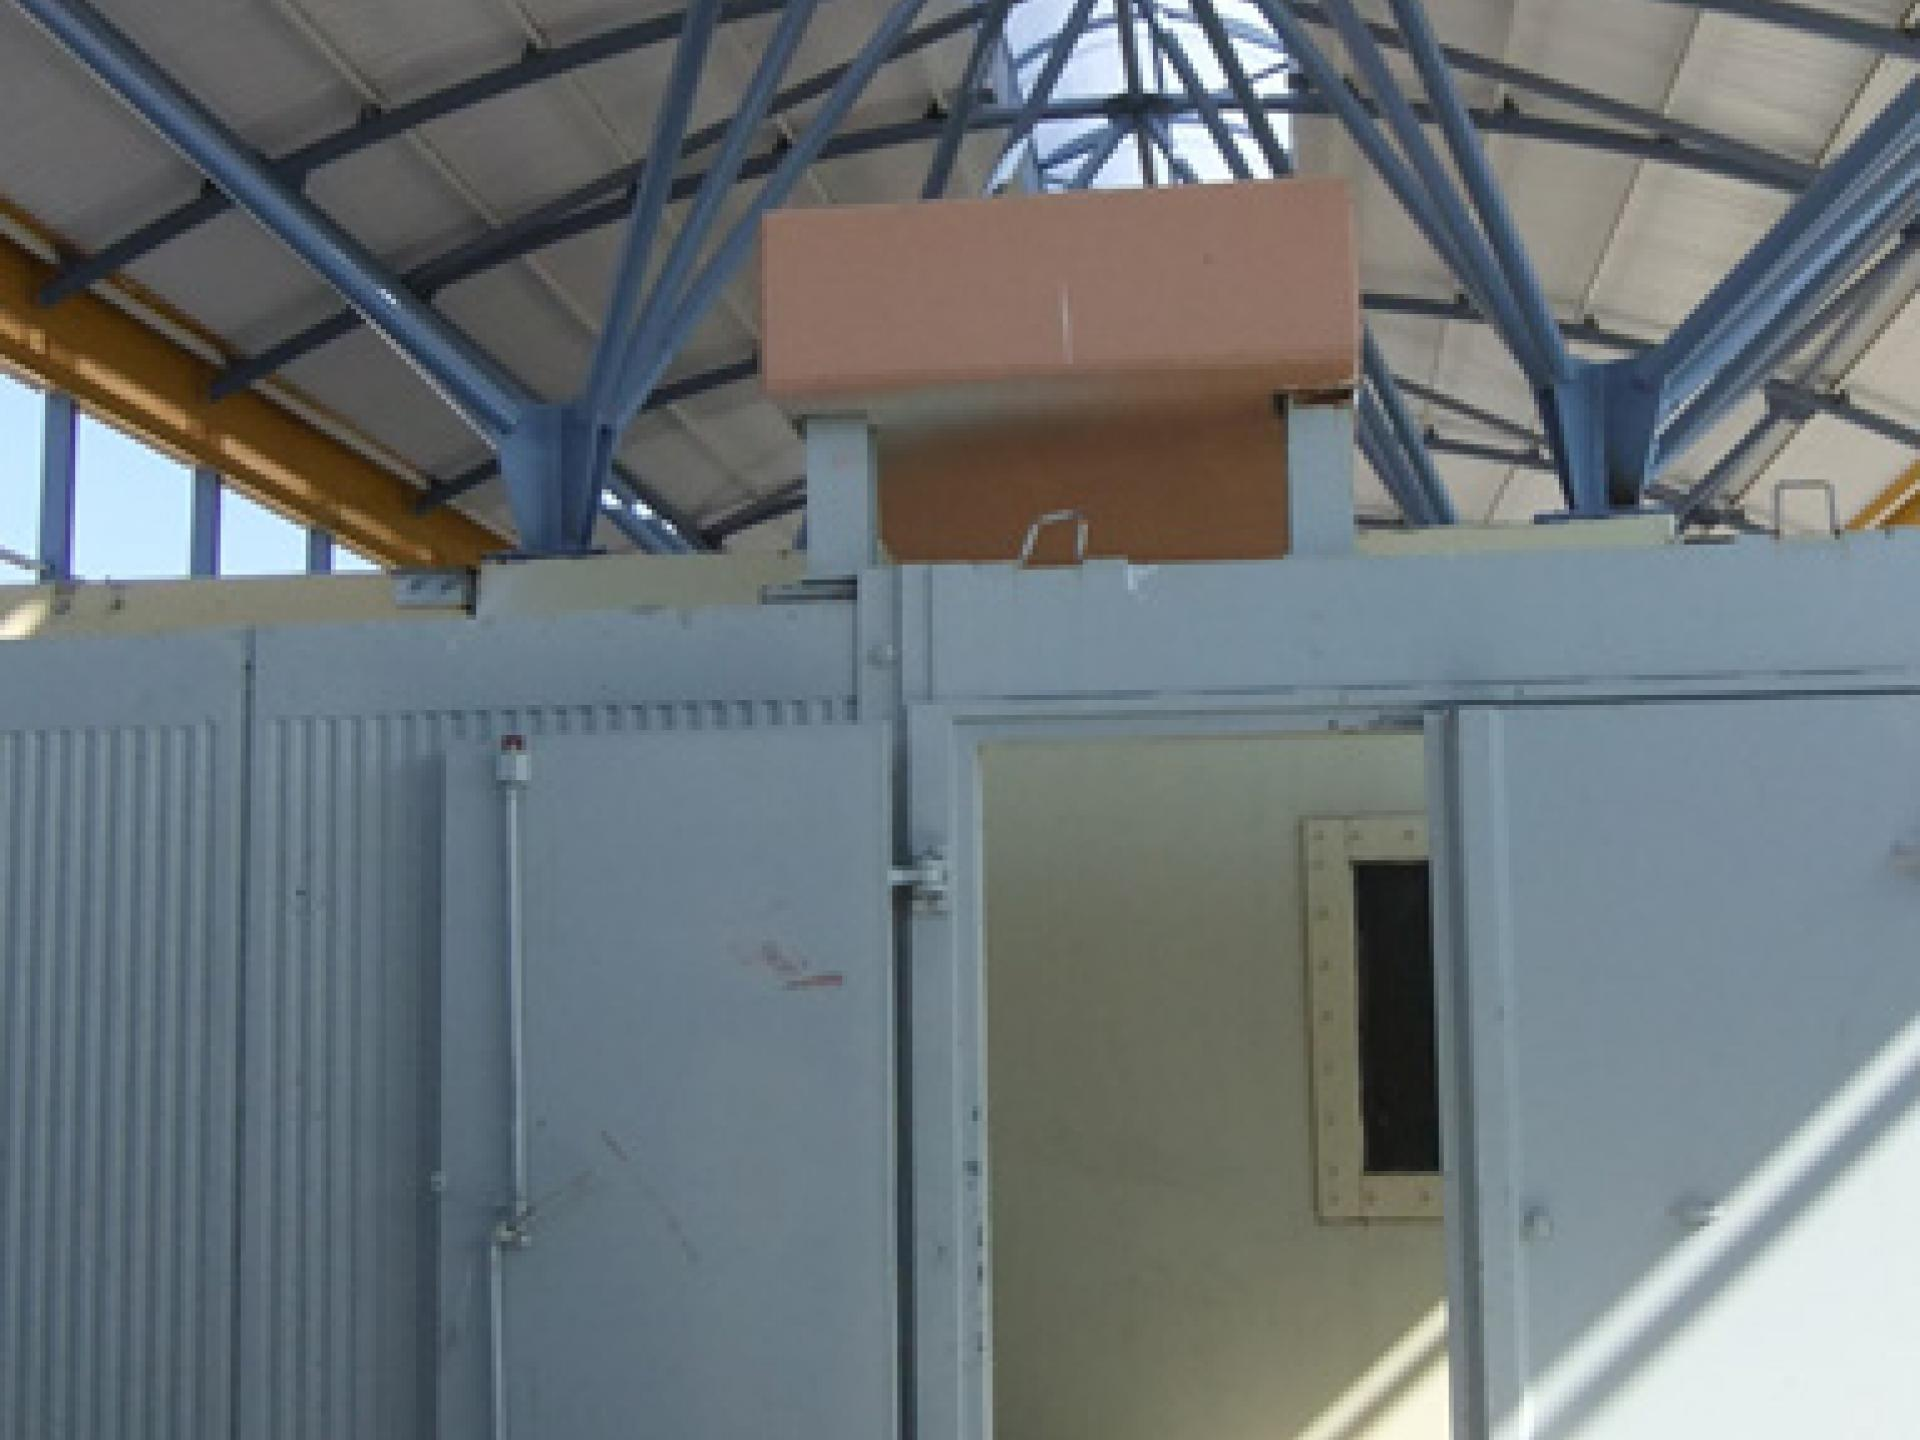 Ni'lin/Kiryat Sefer checkpoint 01.06.11